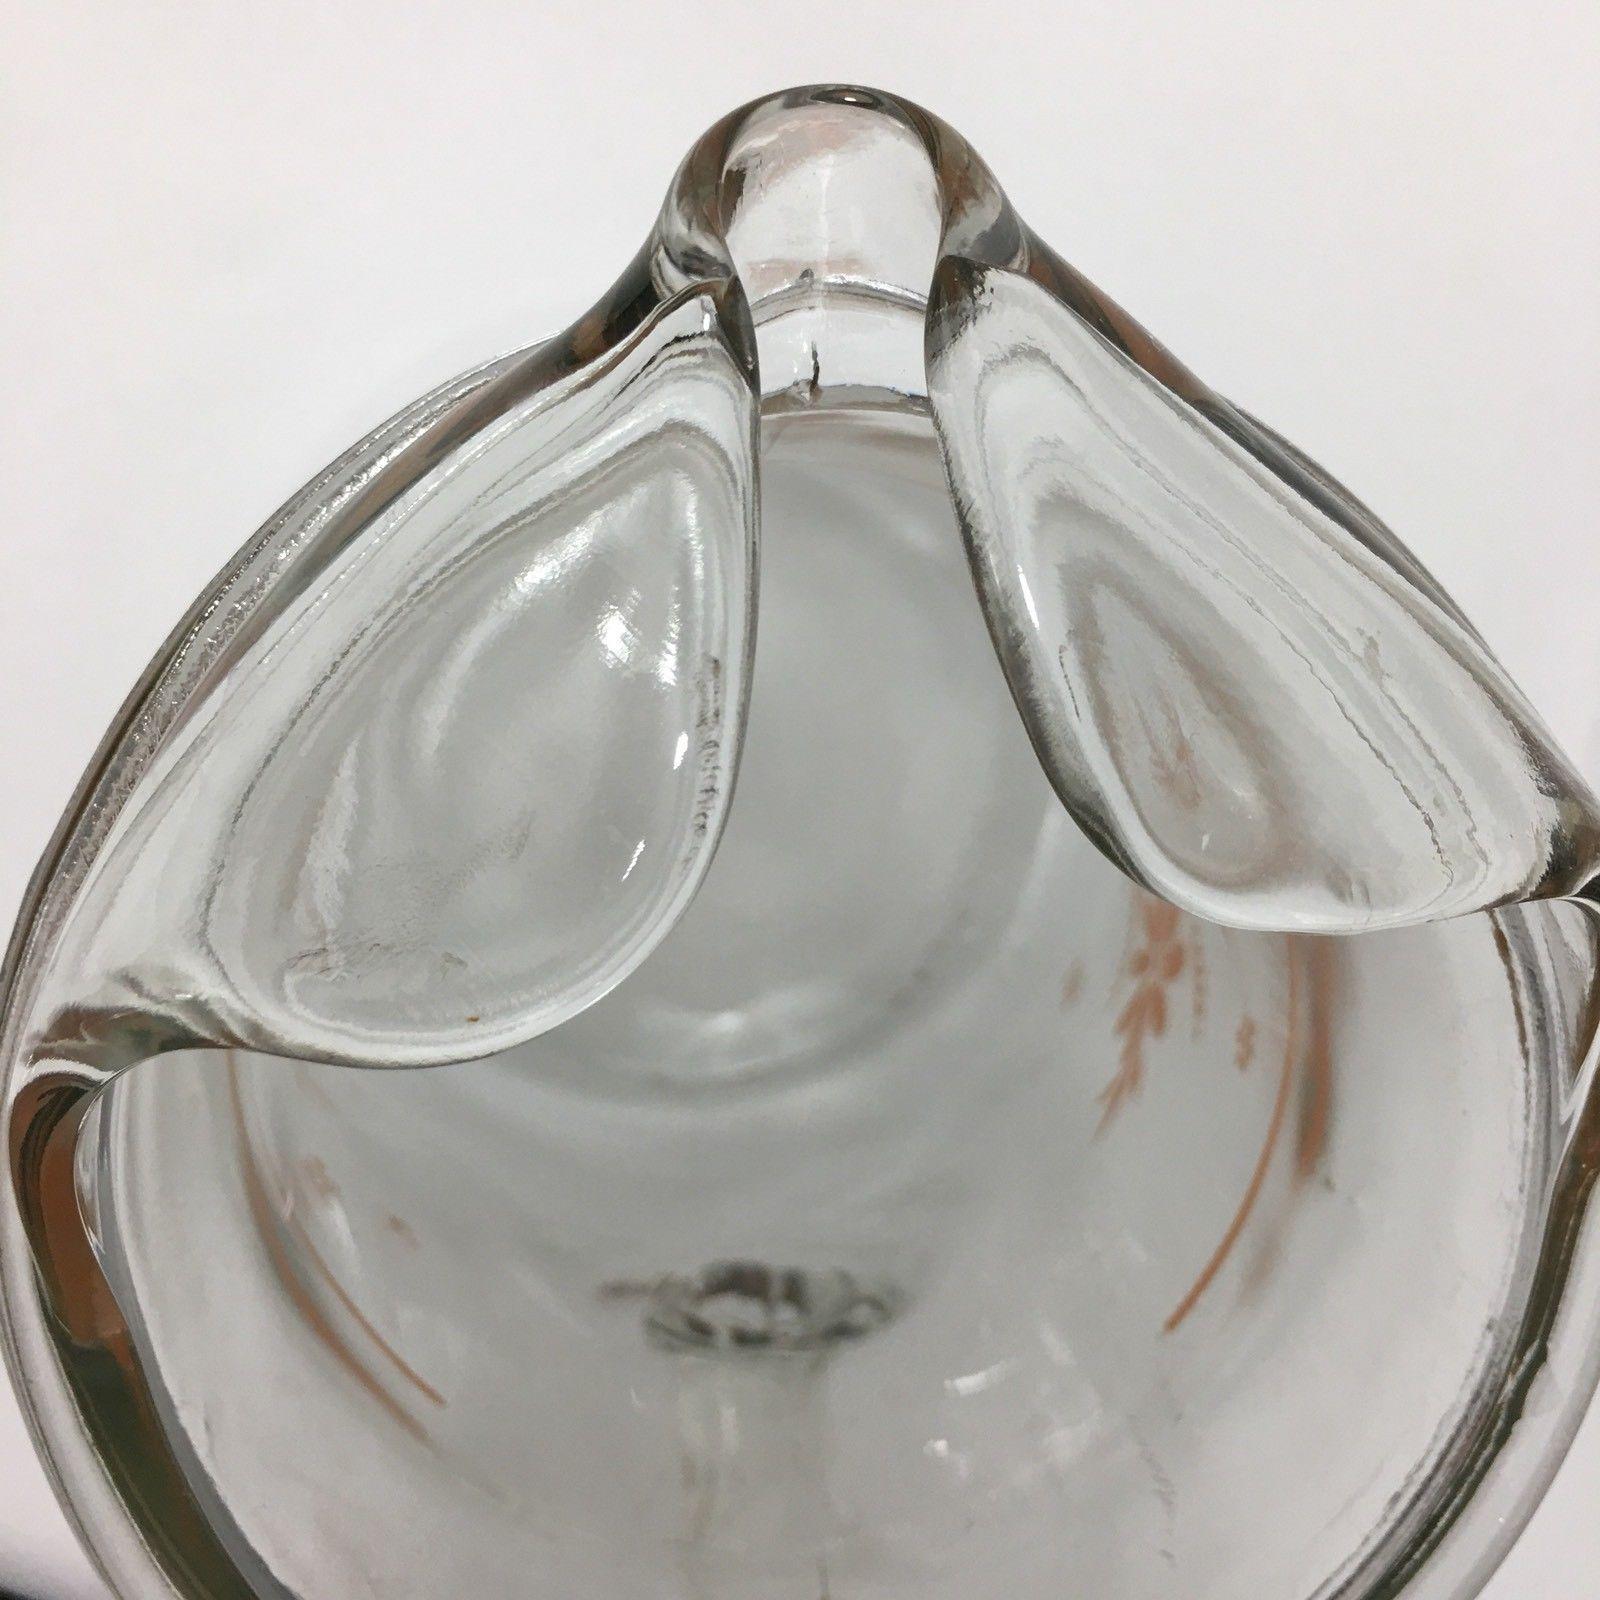 Vintage Glass Pitcher With Peach Orange Flower Design Water Ice Tea Floral